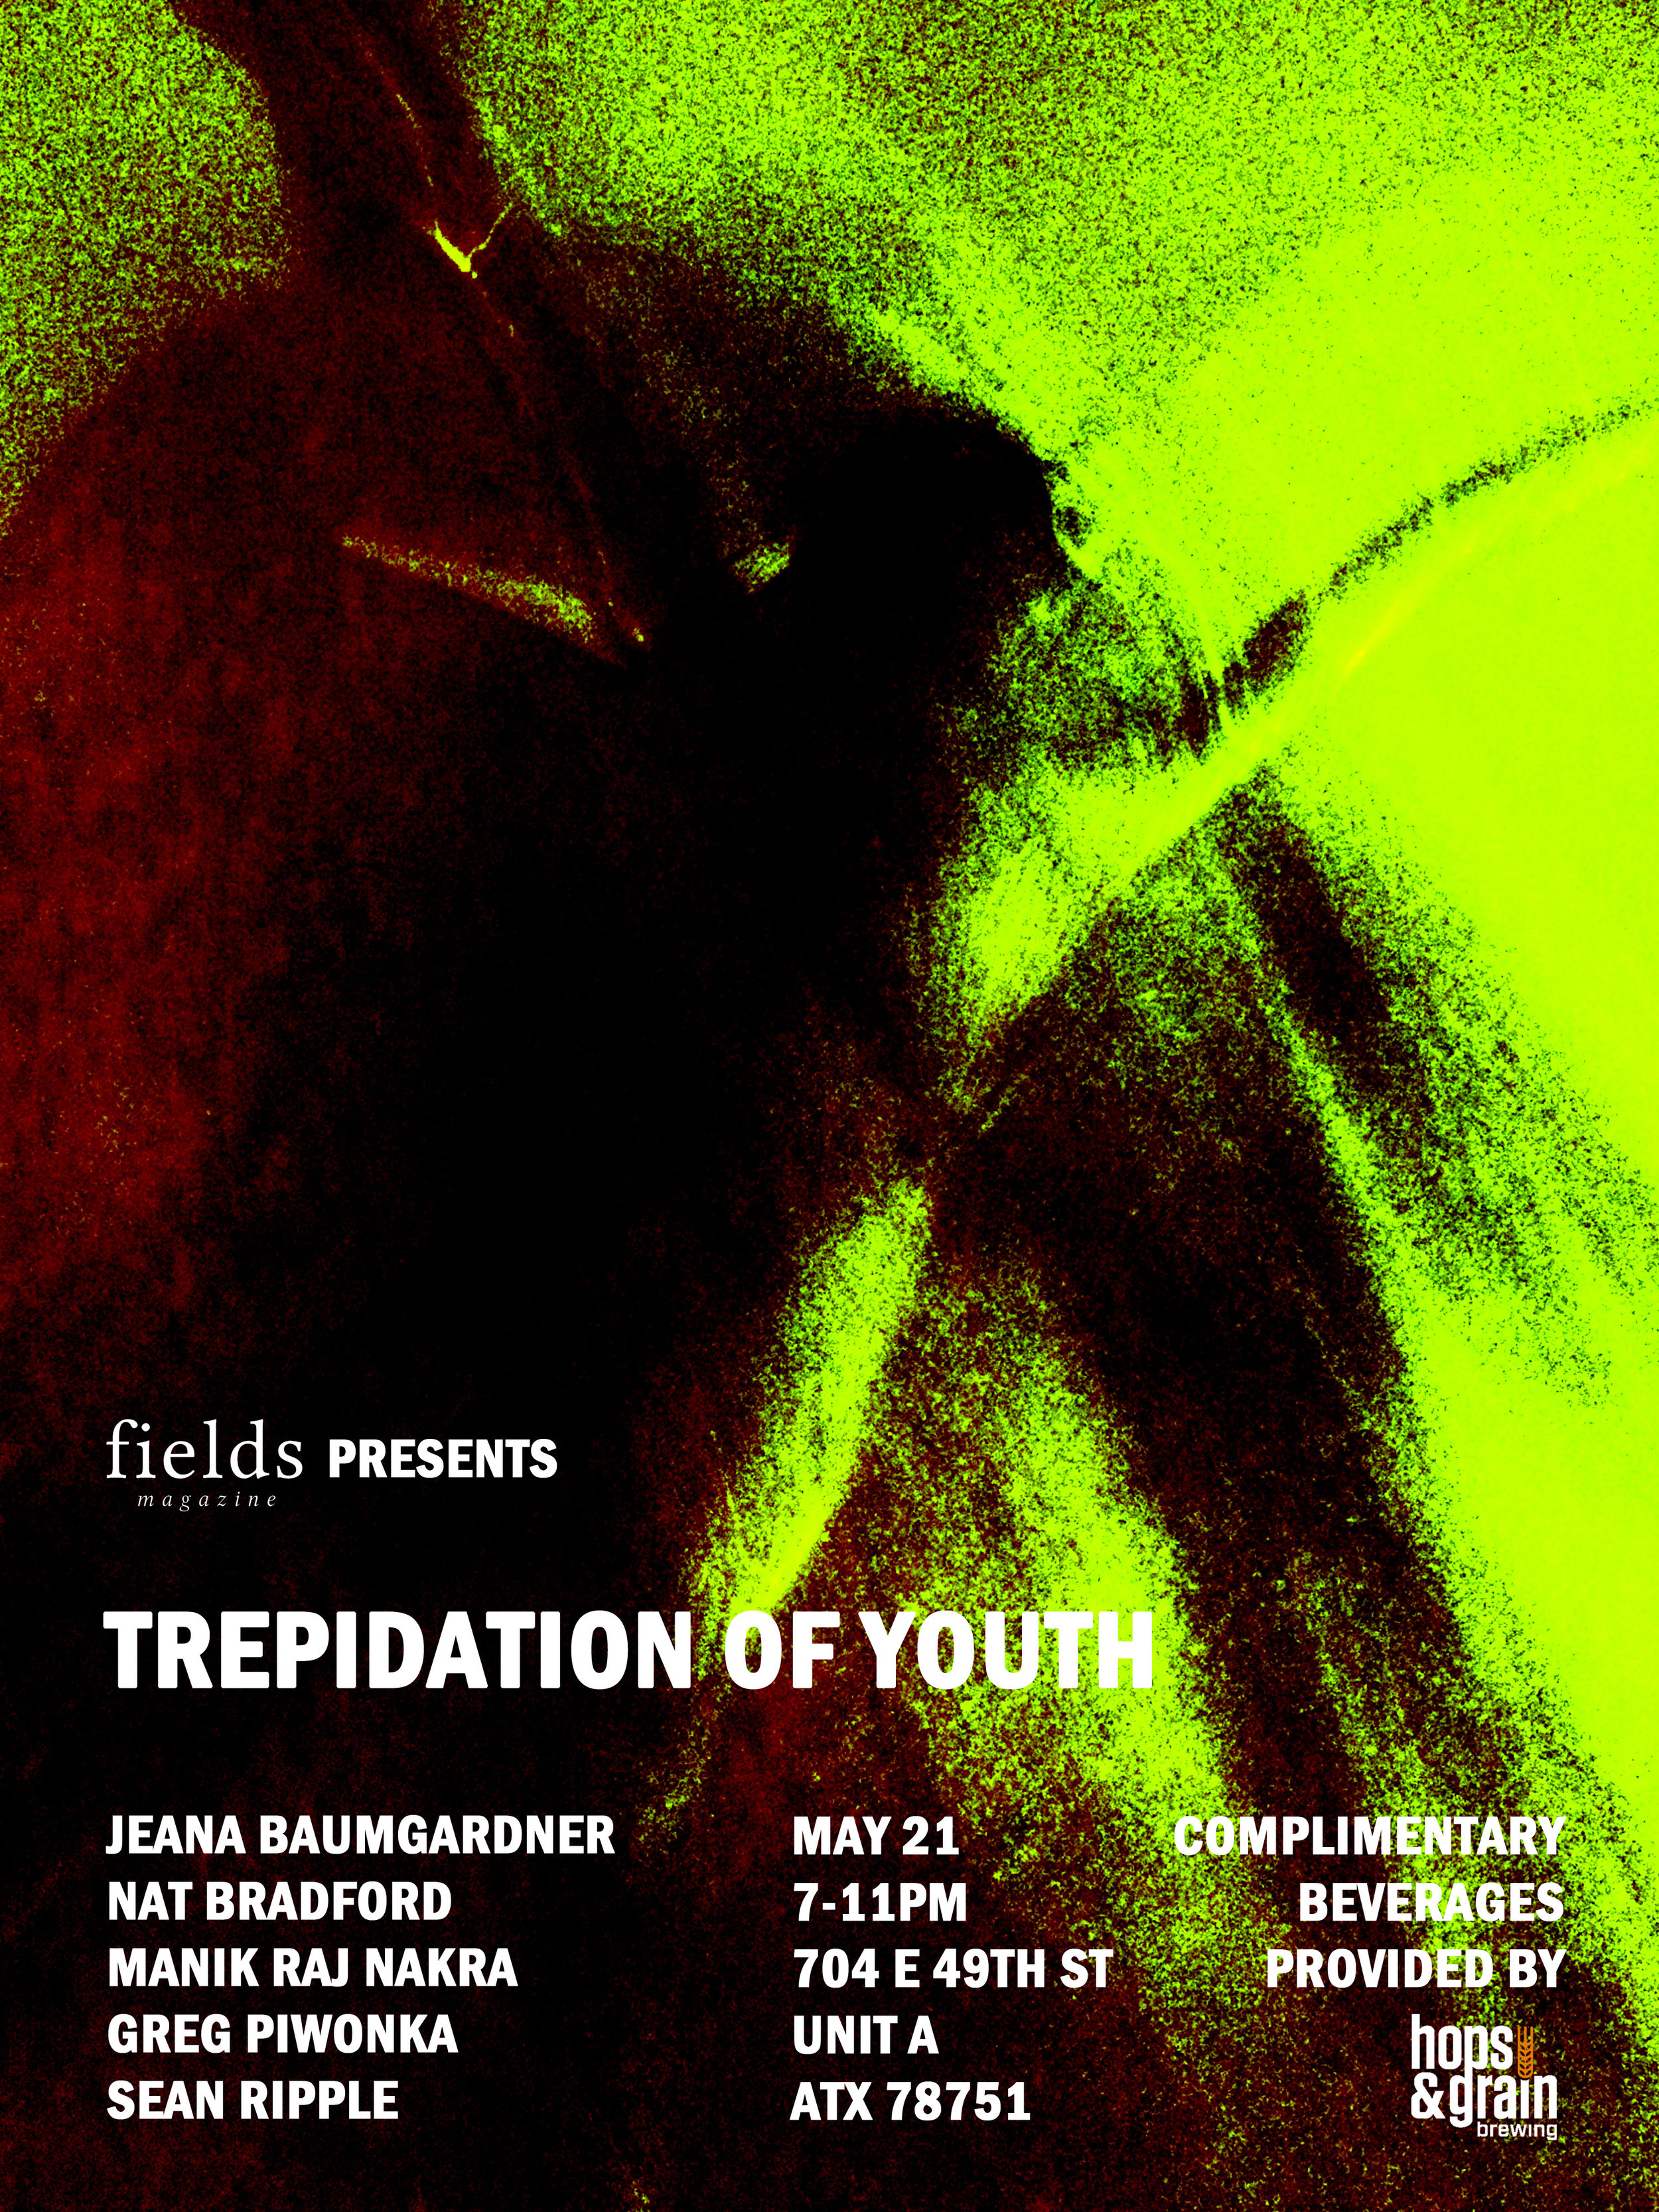 Trepidation of Youth